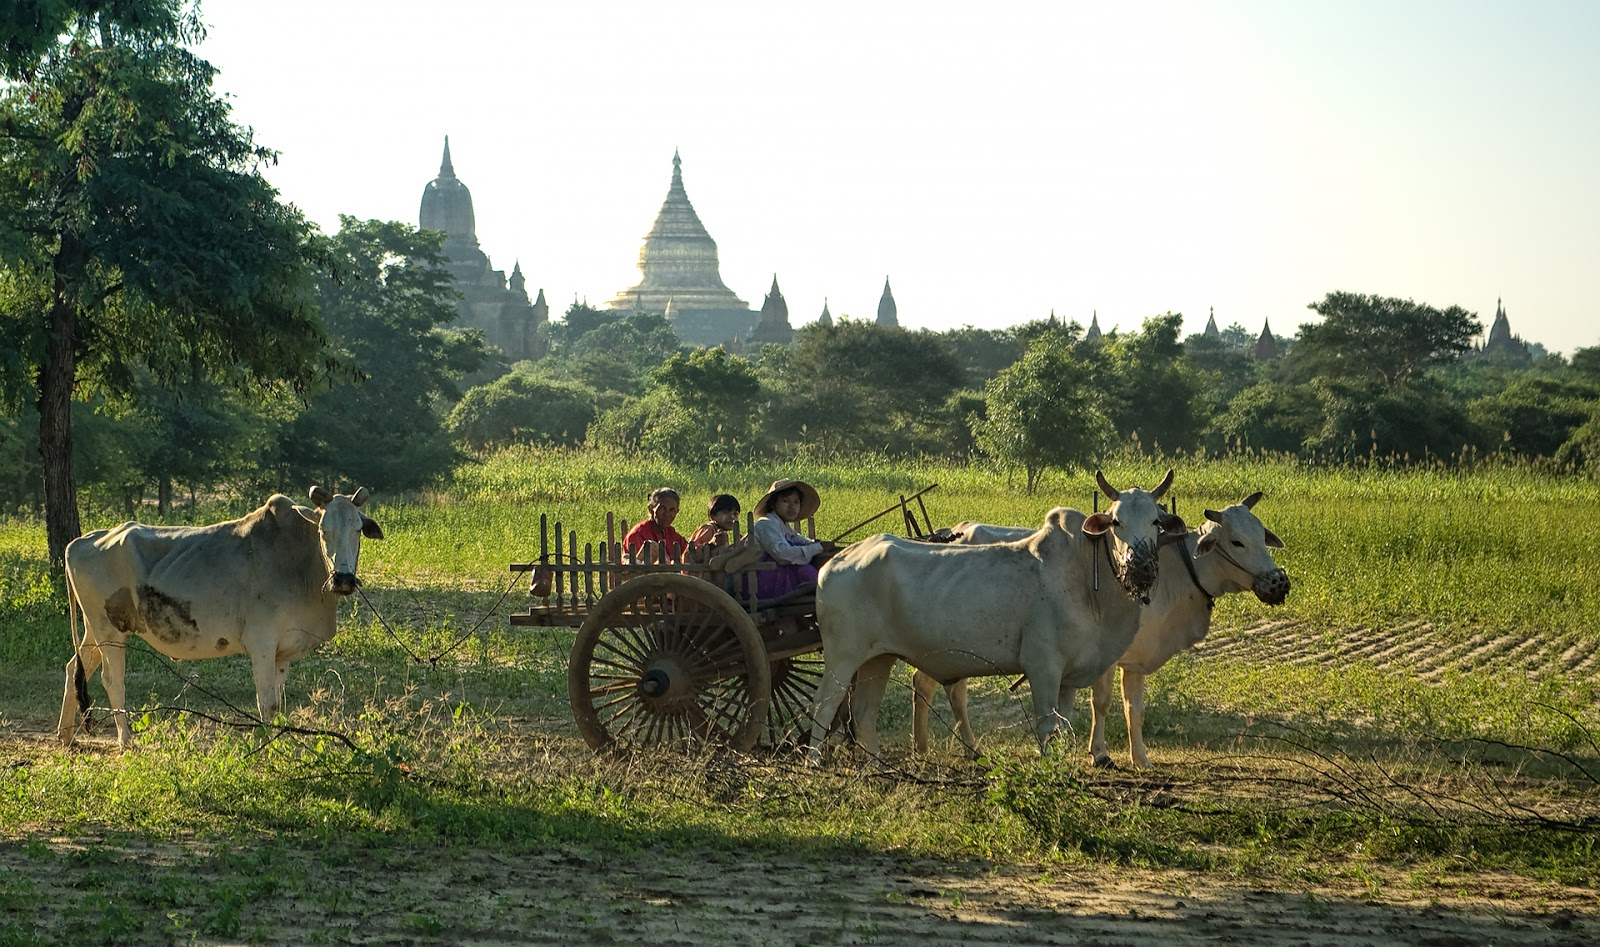 ludzie,bydło,kolaska,pagody,bagan,birma